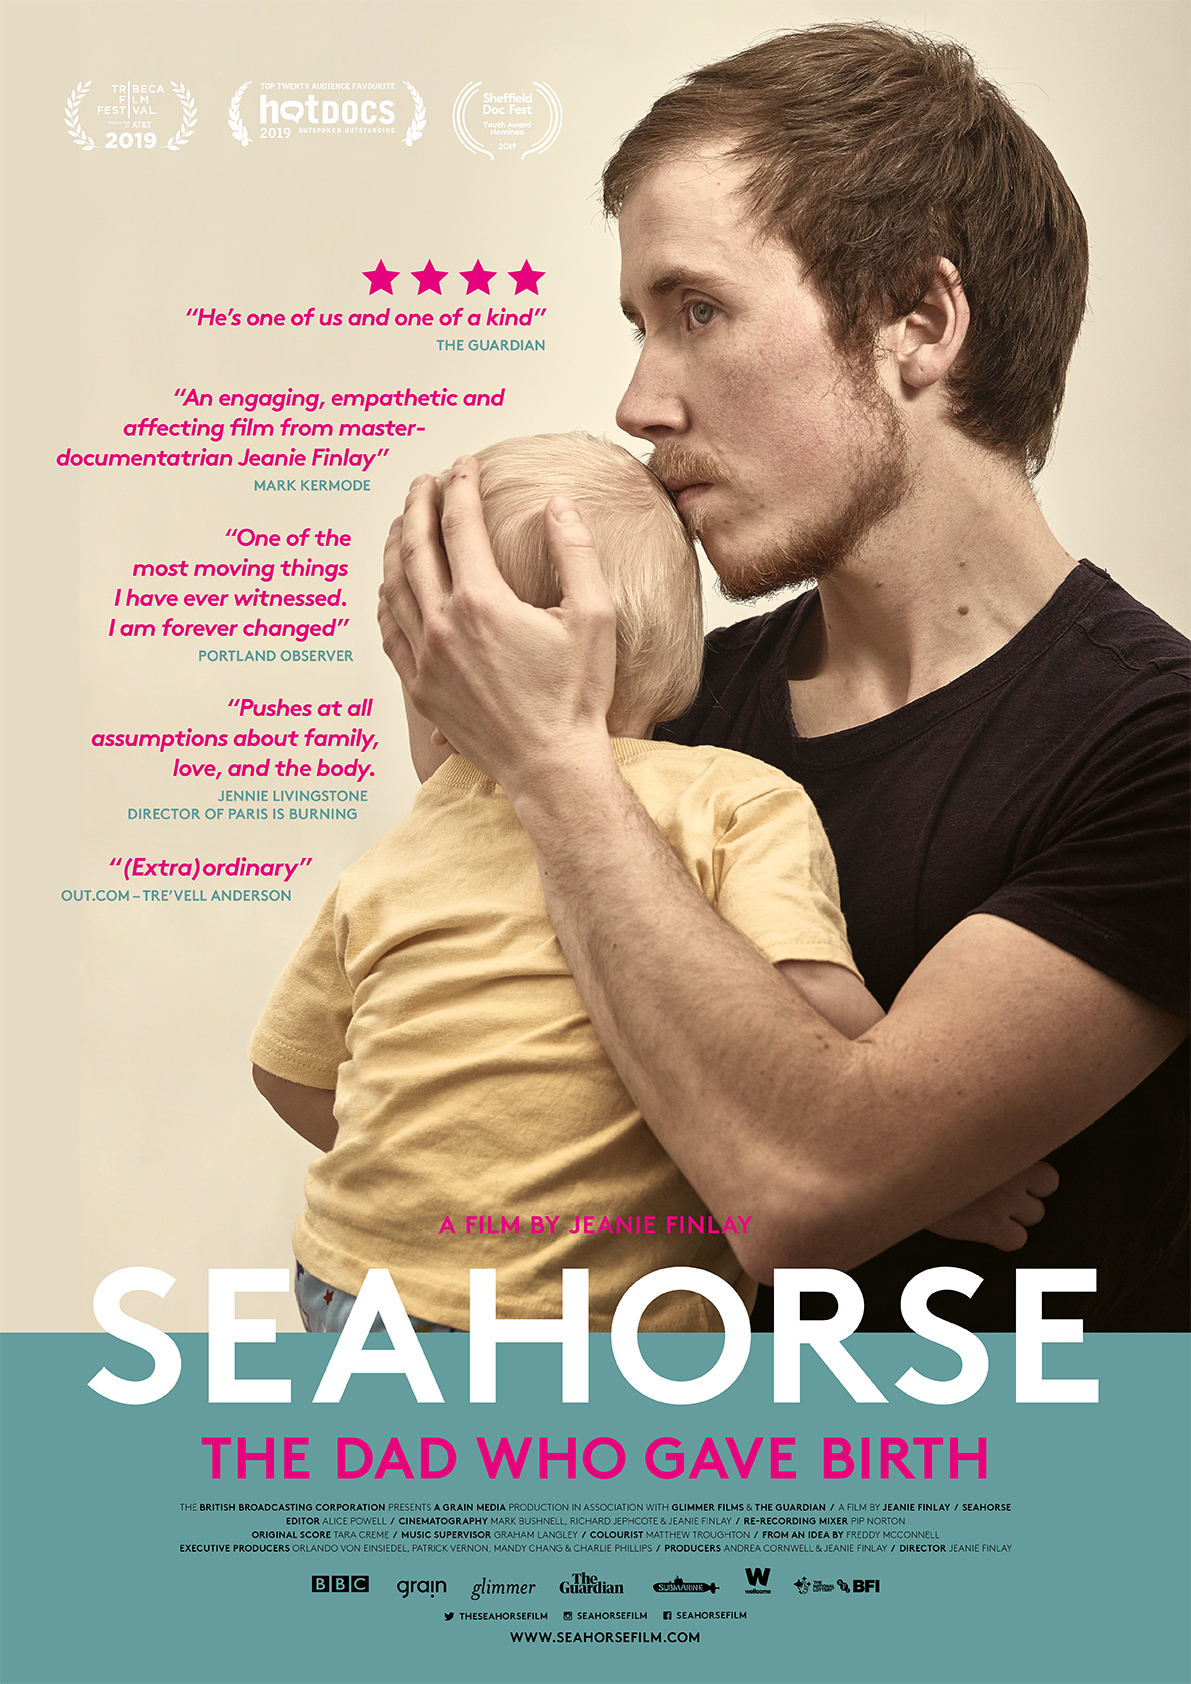 Seahorse_A2Postersml.jpg